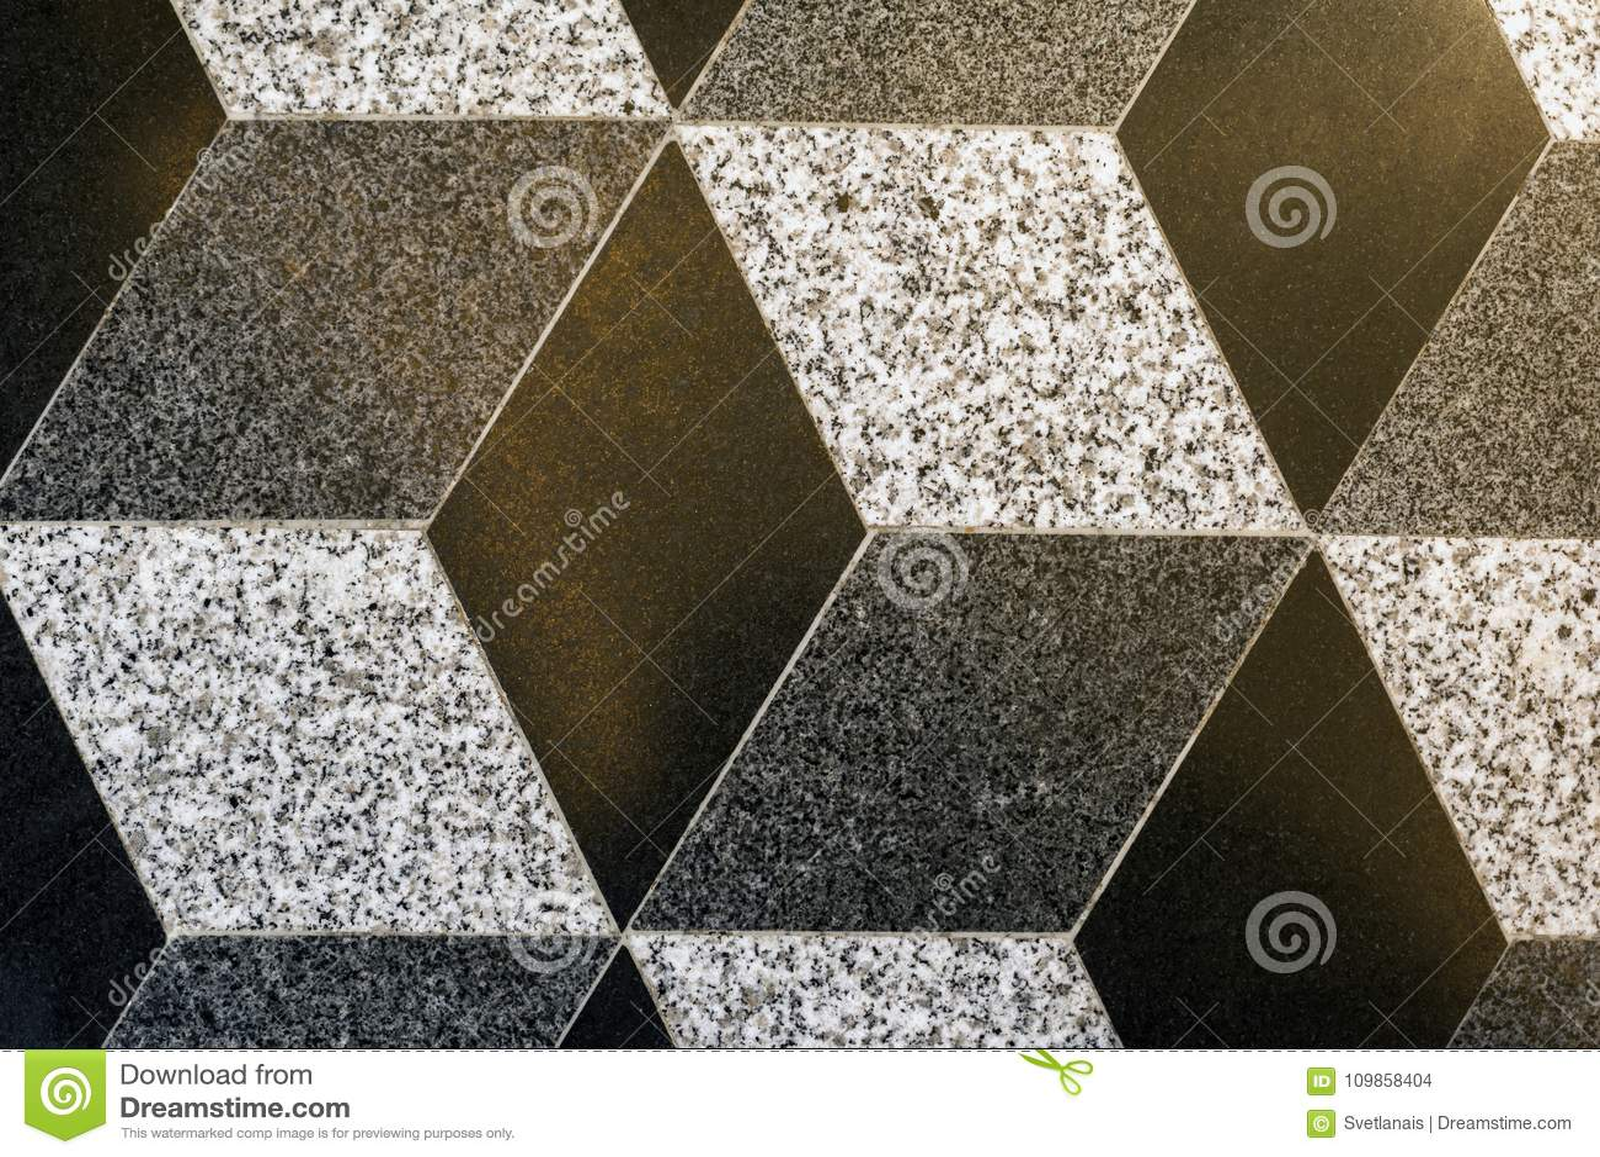 Part Of Mosaic Rhombus Ceramic Floor Tiles Background Texture